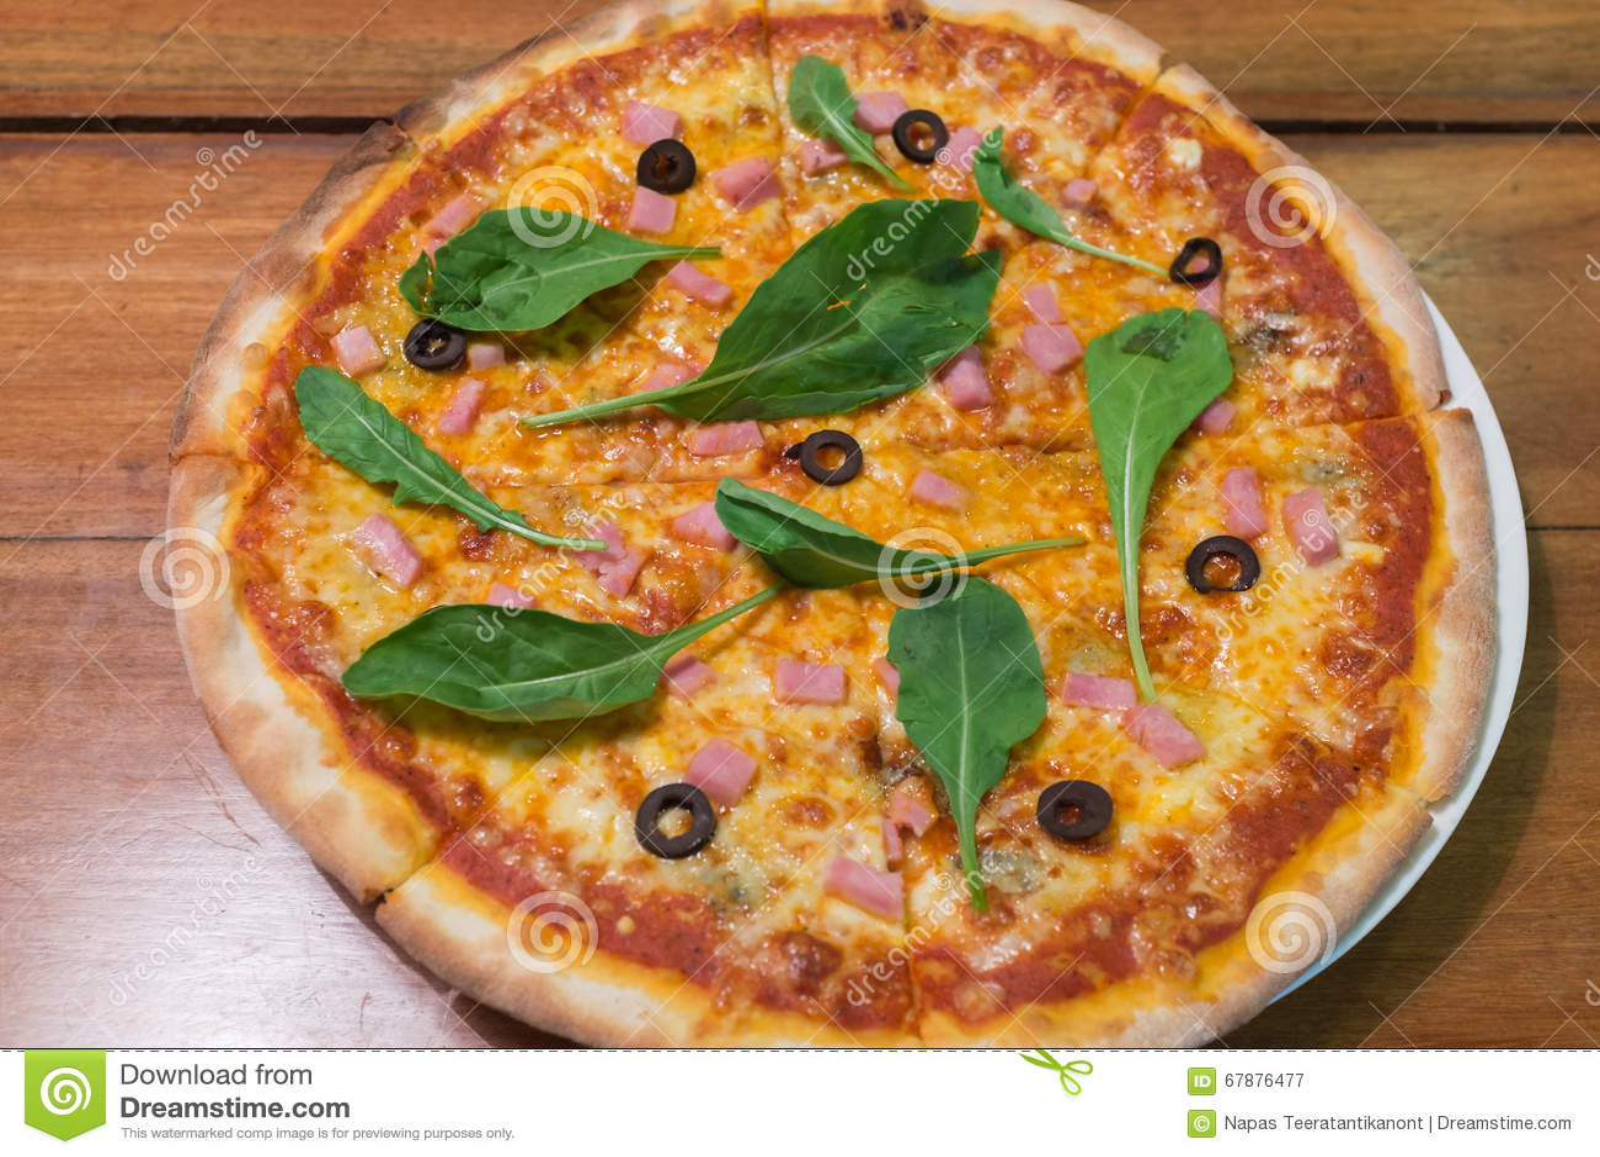 Traditional wood burn Italian pizza